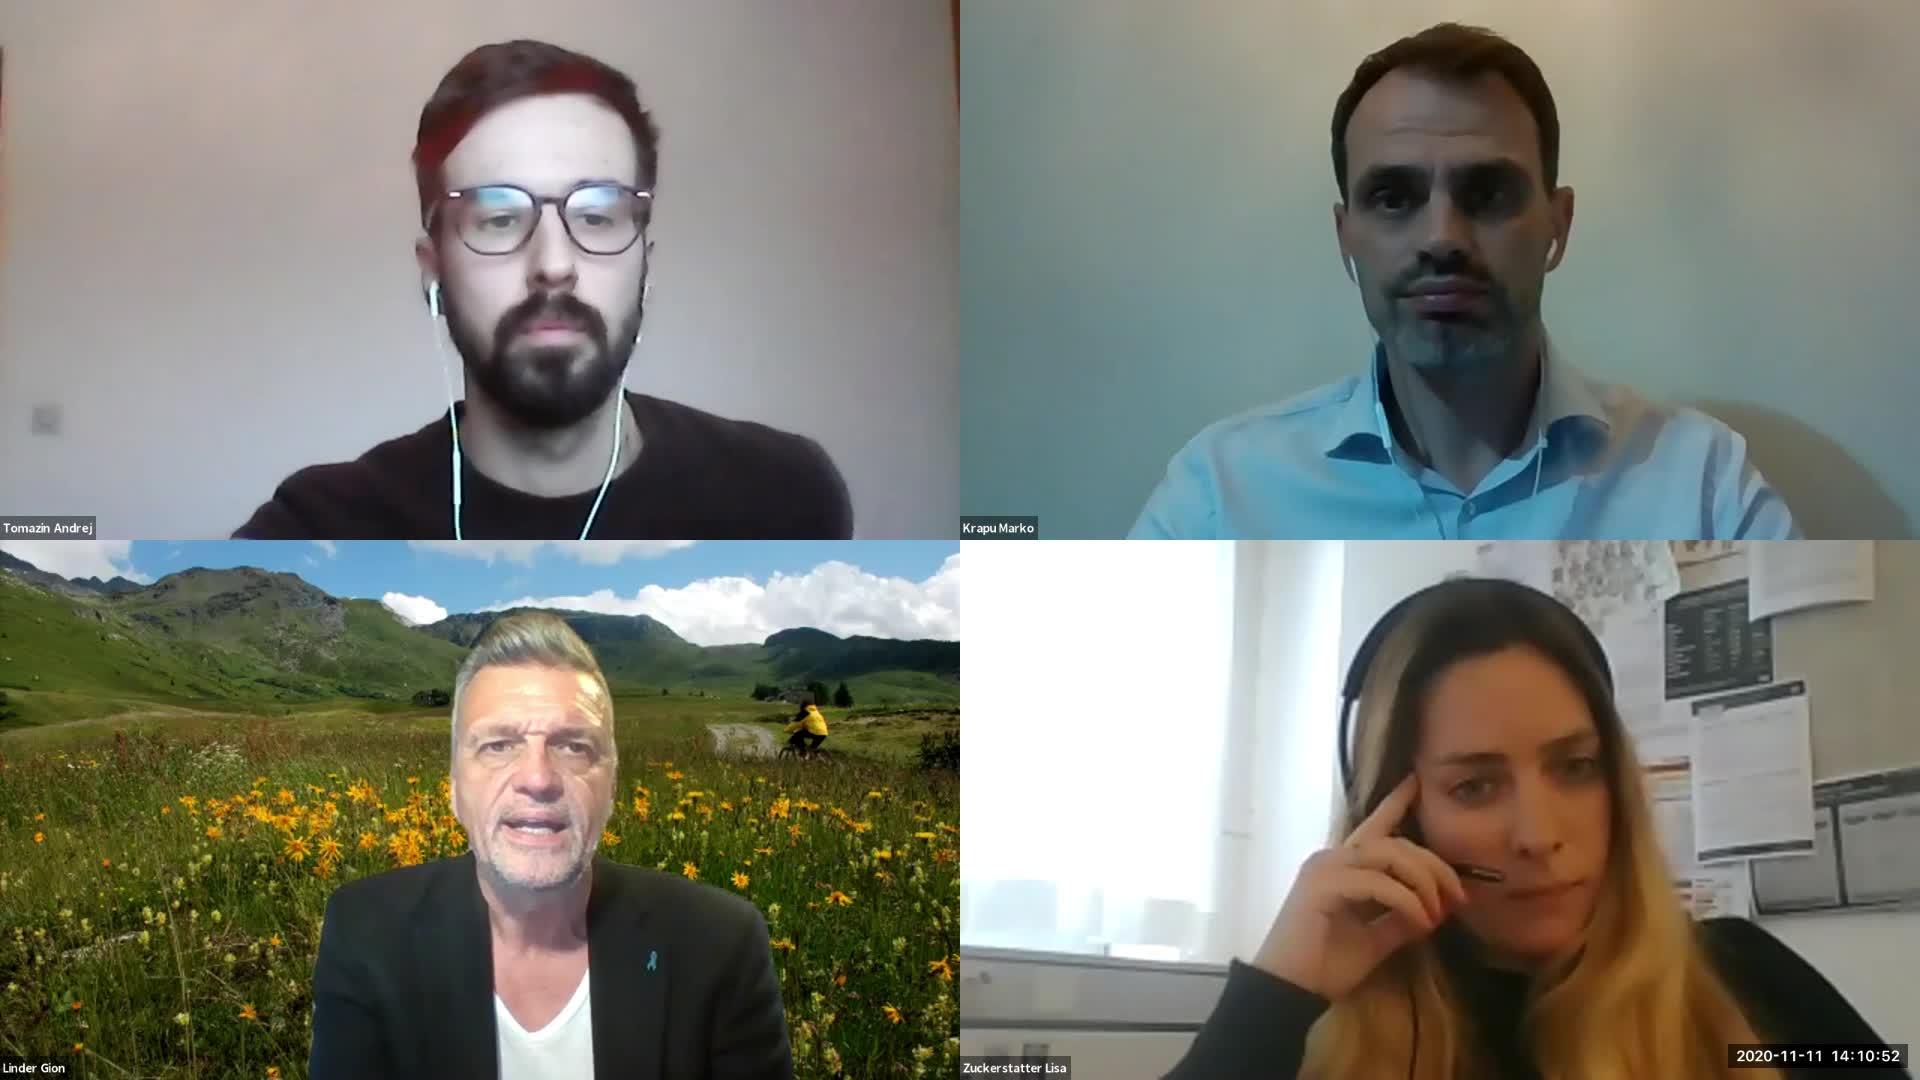 Access Services Experts Q&A (Session 2 part 1)